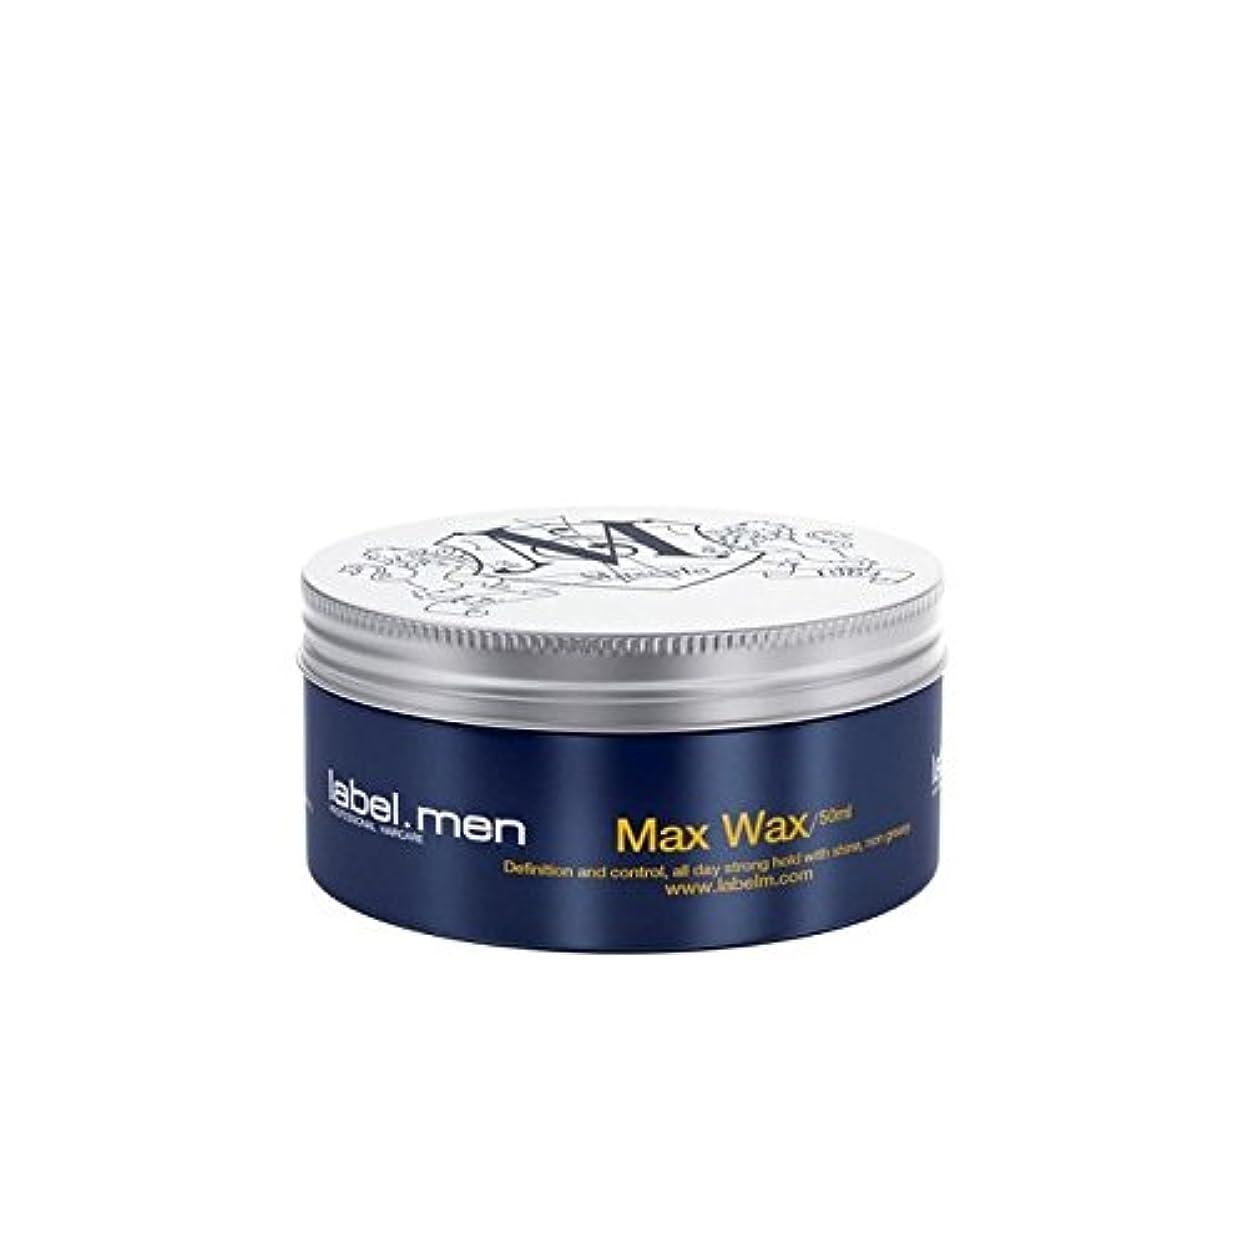 Label.Men Max Wax (50ml) (Pack of 6) - .マックスワックス(50ミリリットル) x6 [並行輸入品]